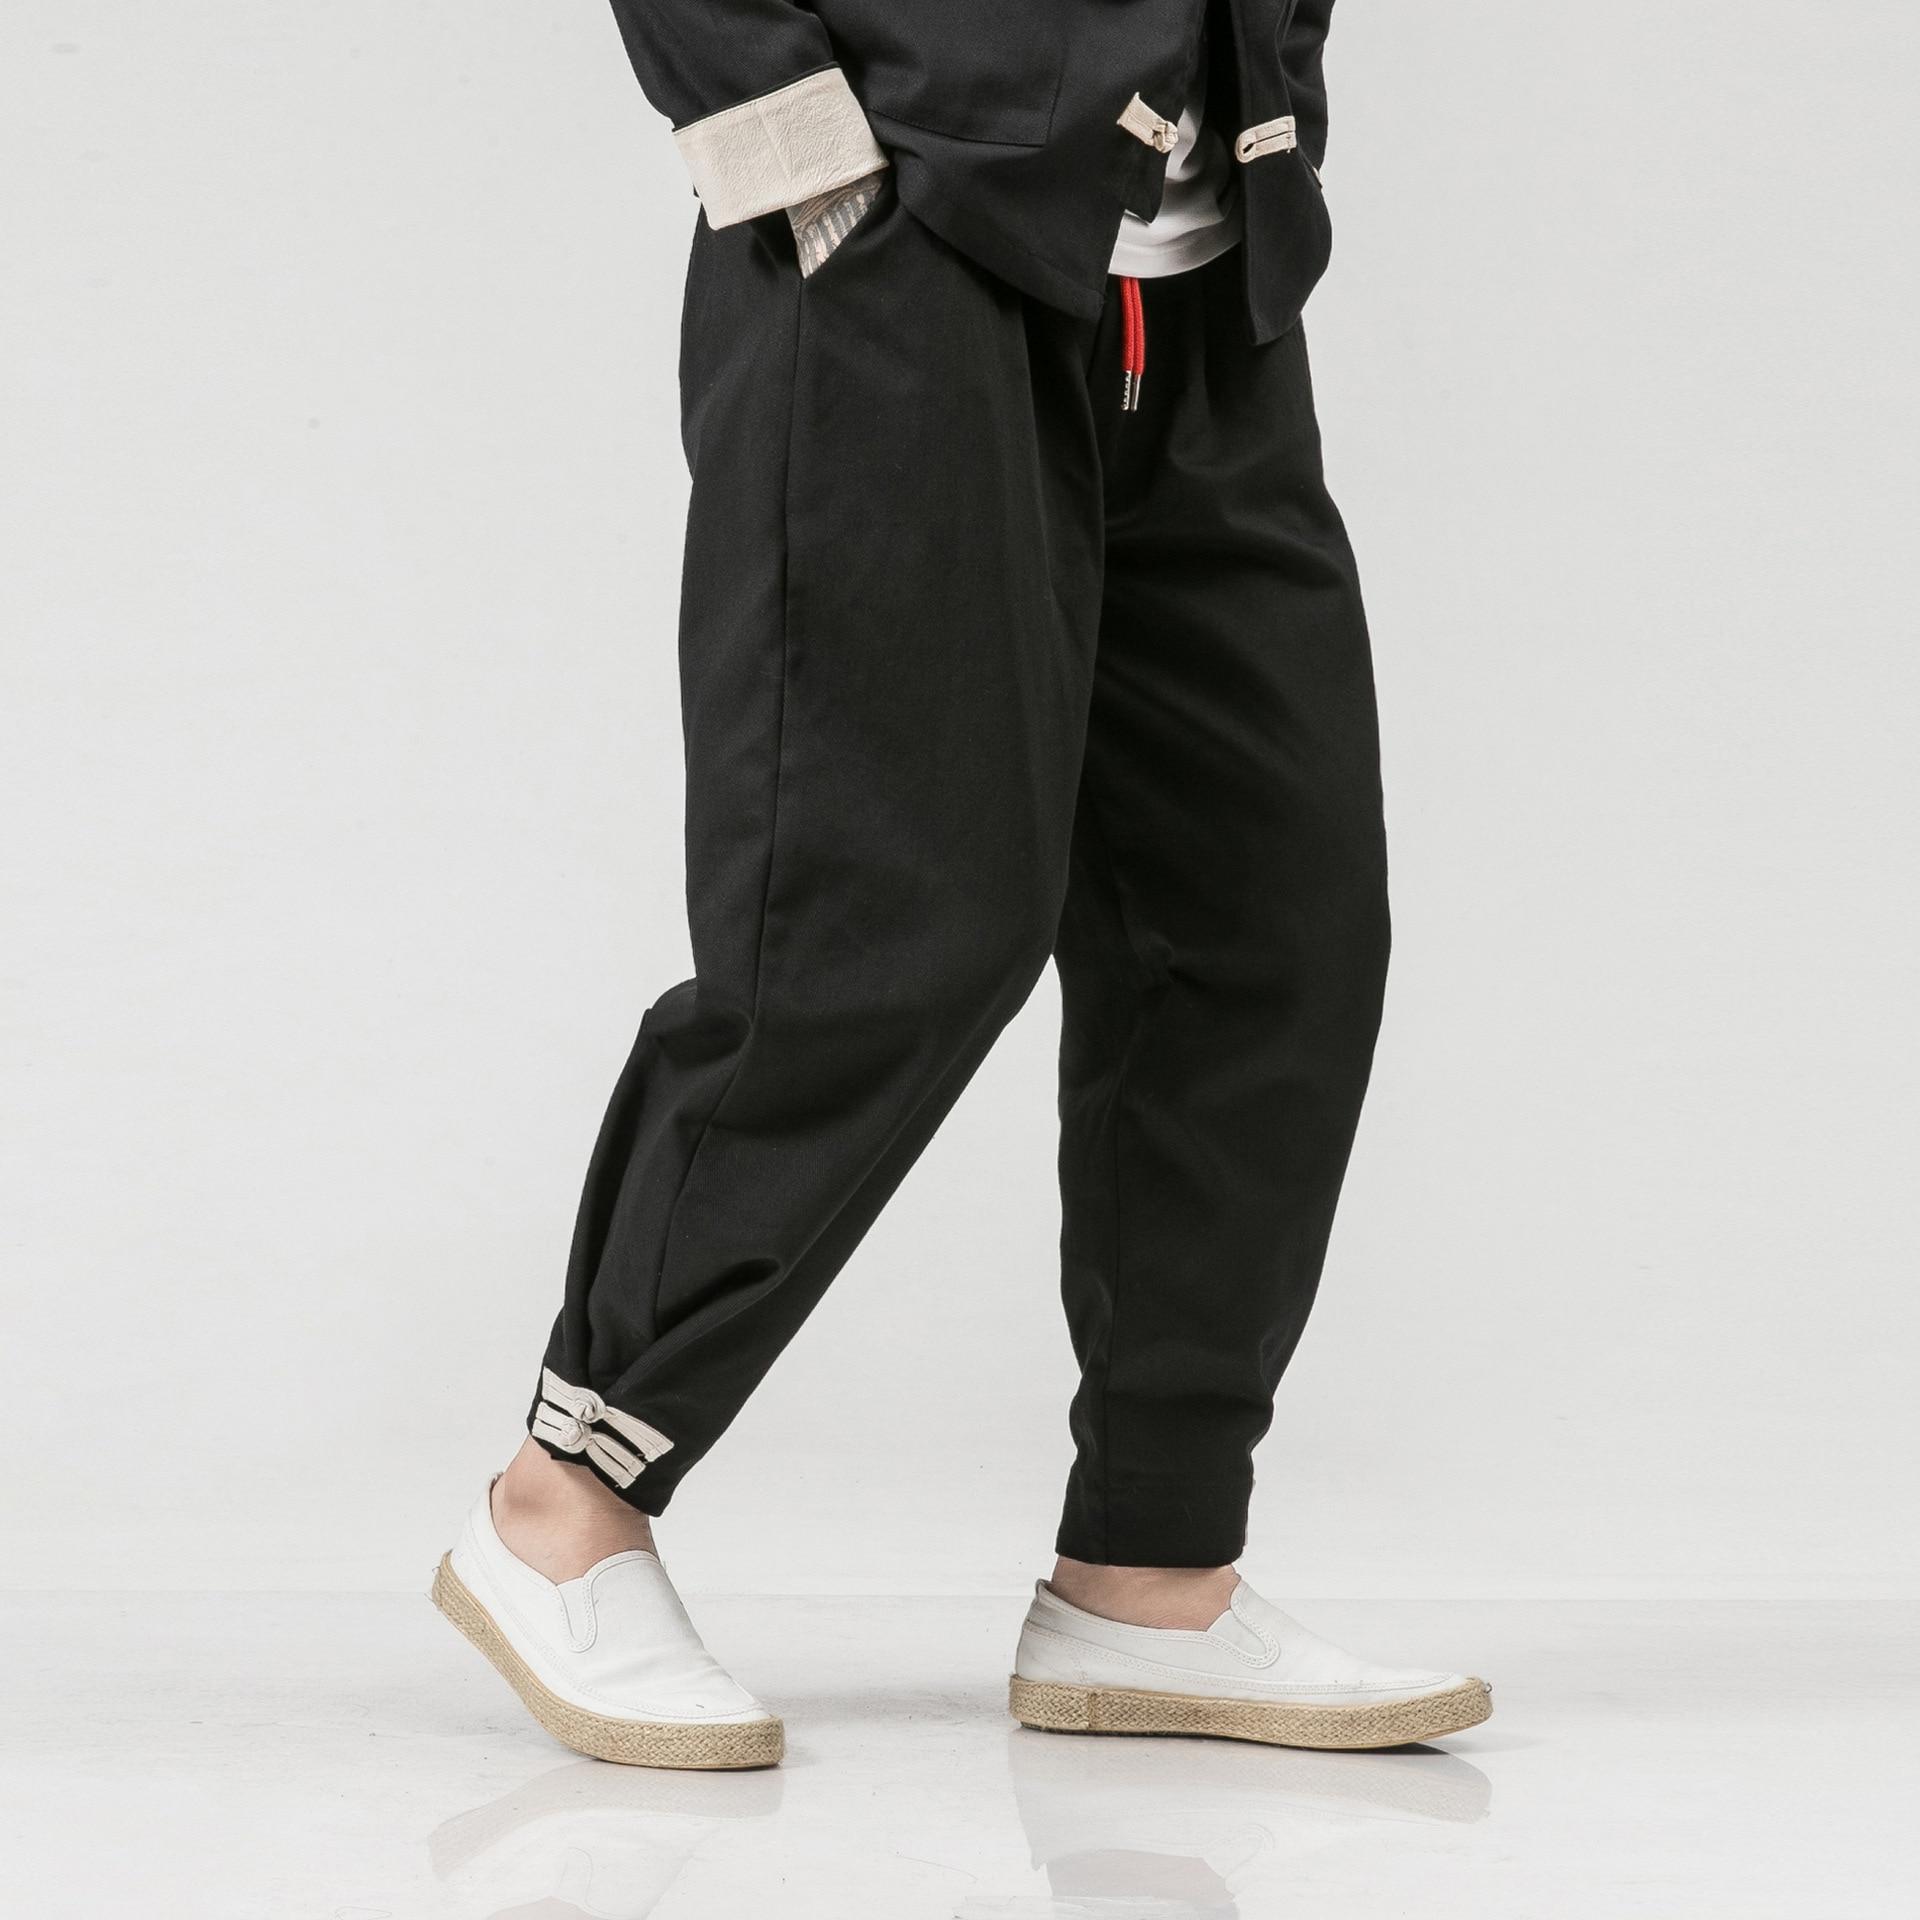 Origional Autumn Chinese-style Large Size MEN'S Casual Pants Frog Cotton Harem Pants Loose-Fit Skinny Capri Pants Men's